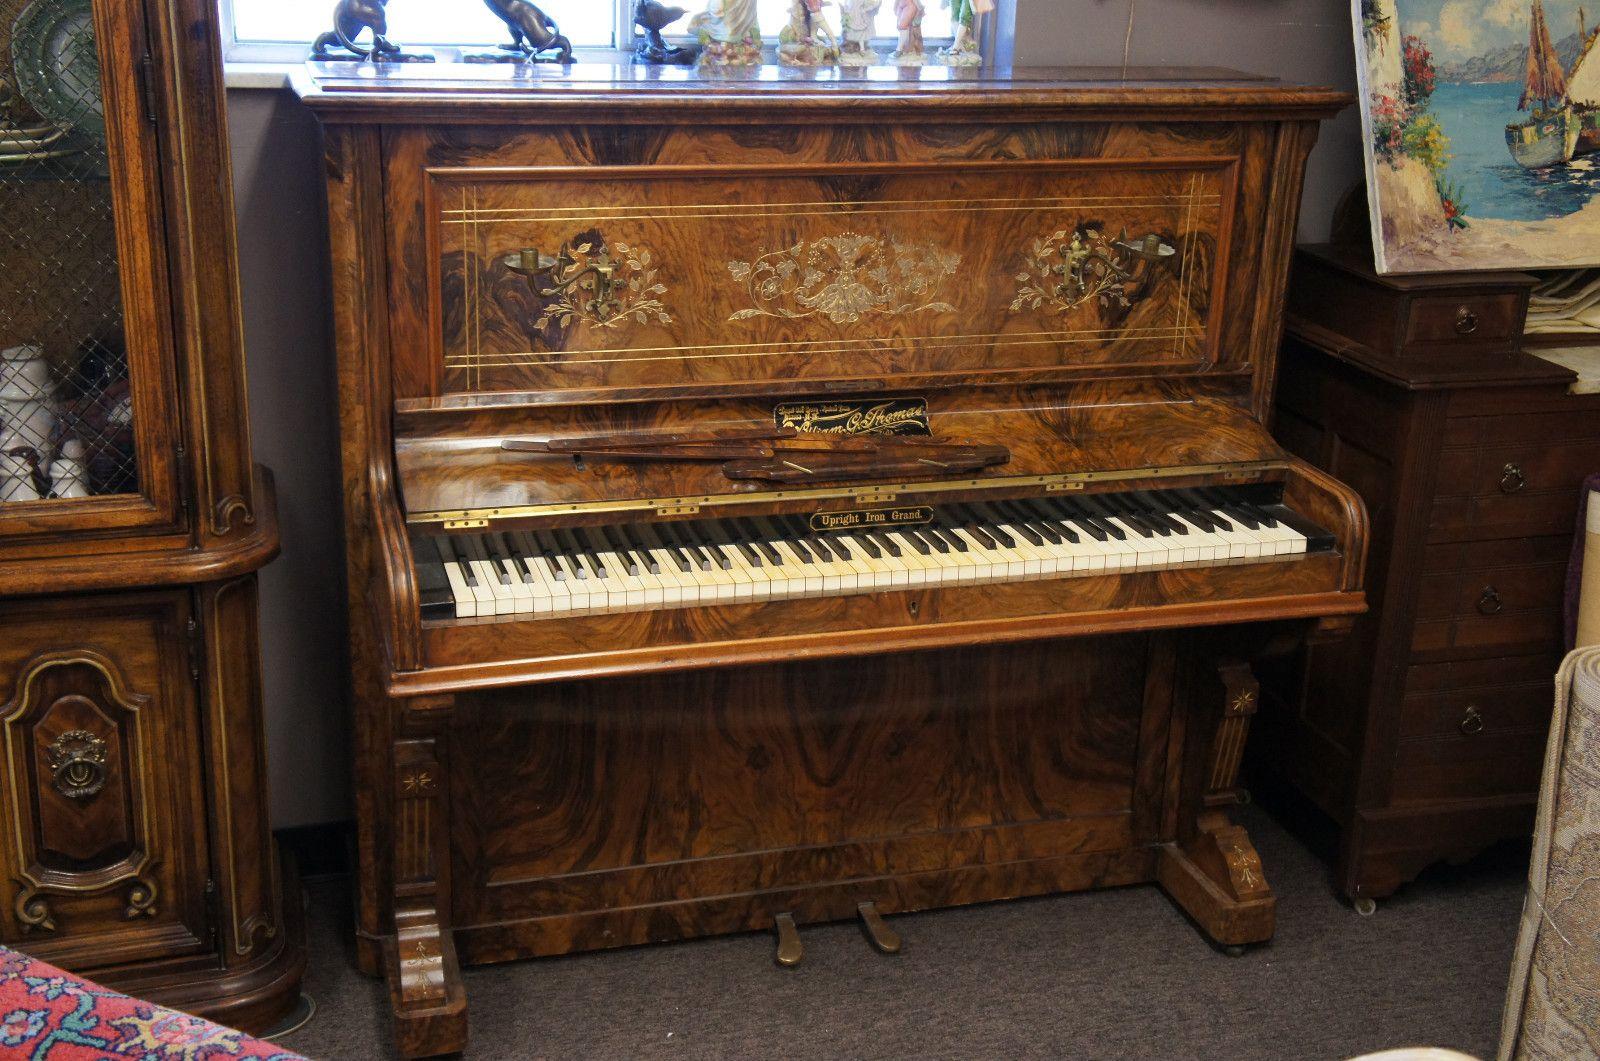 Antique William Thomas Upright Iron Grand Piano 1800s Candelabras